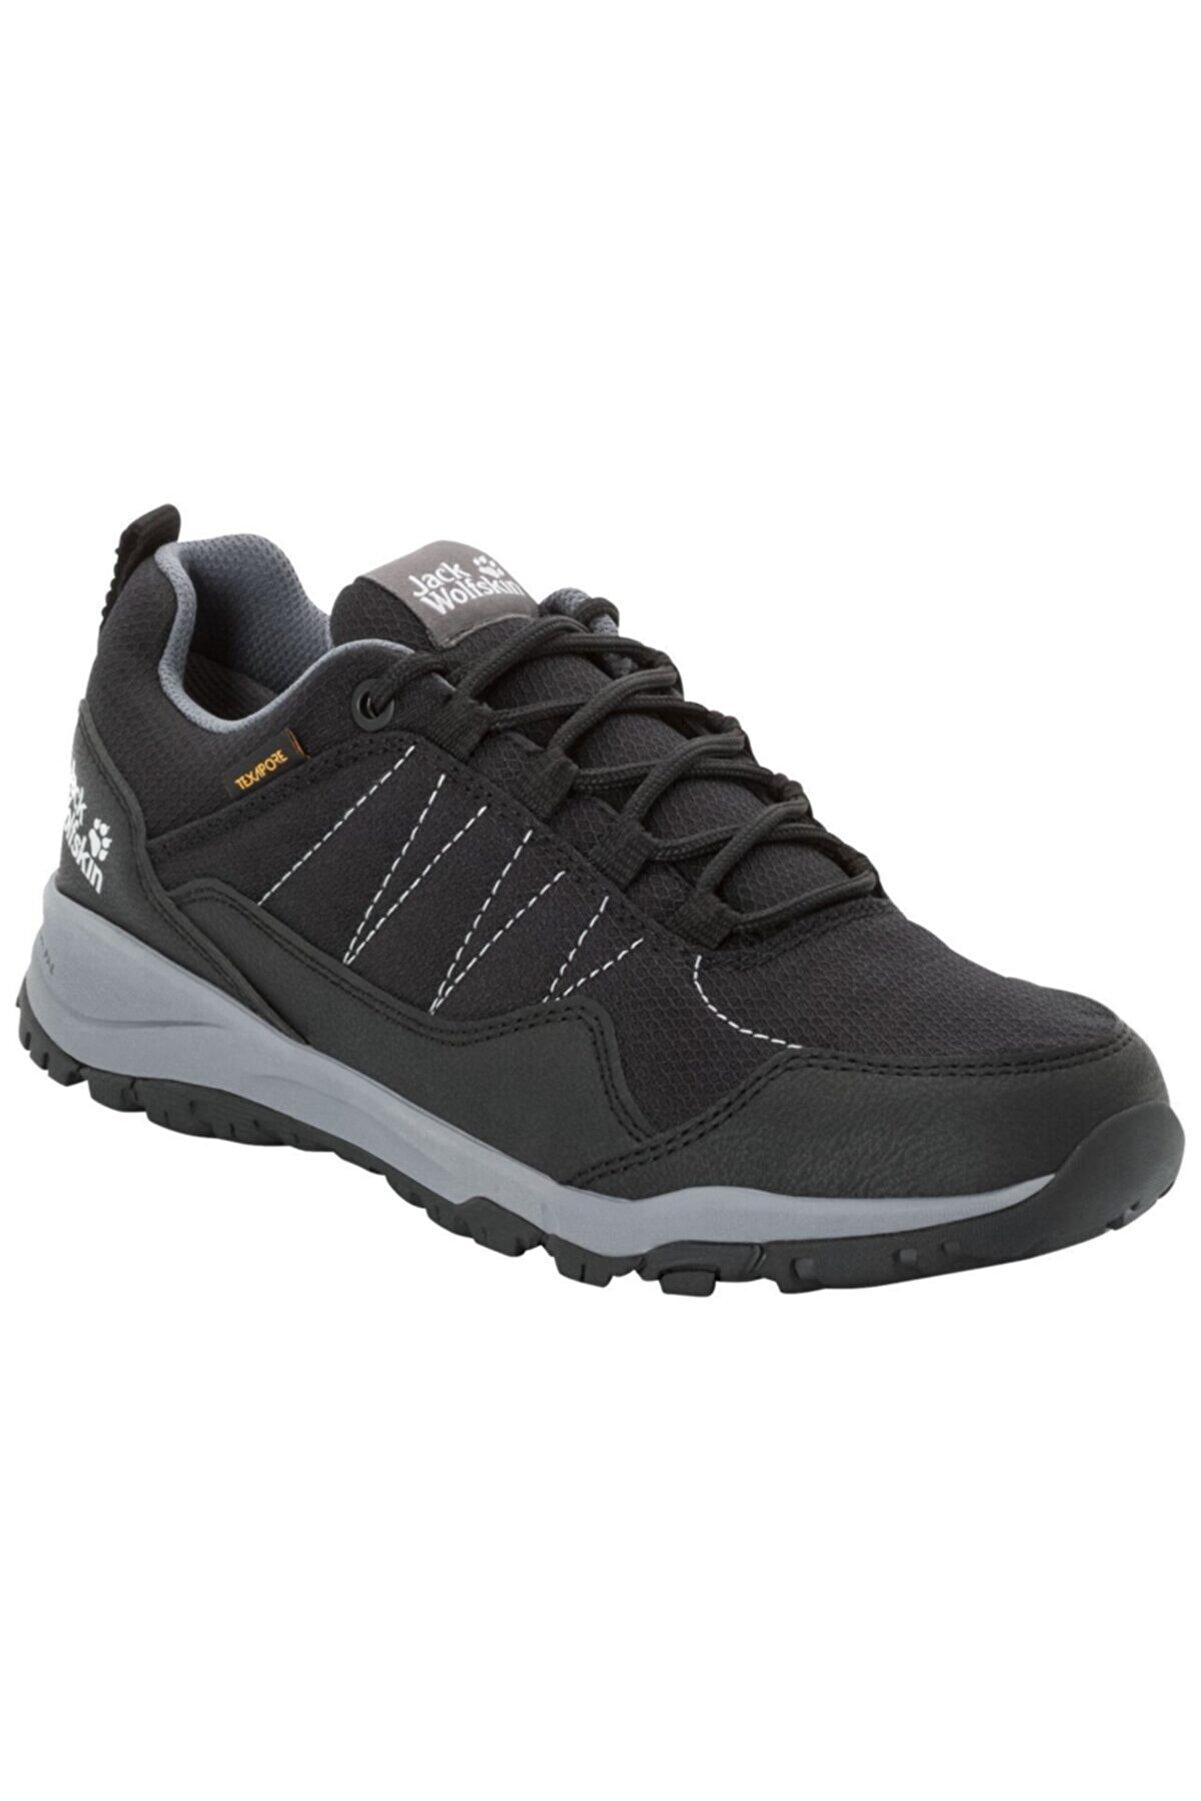 Jack Wolfskin Kadın Siyah Outdoor Ayakkabı Maze Texapore Low - 4035661-6069